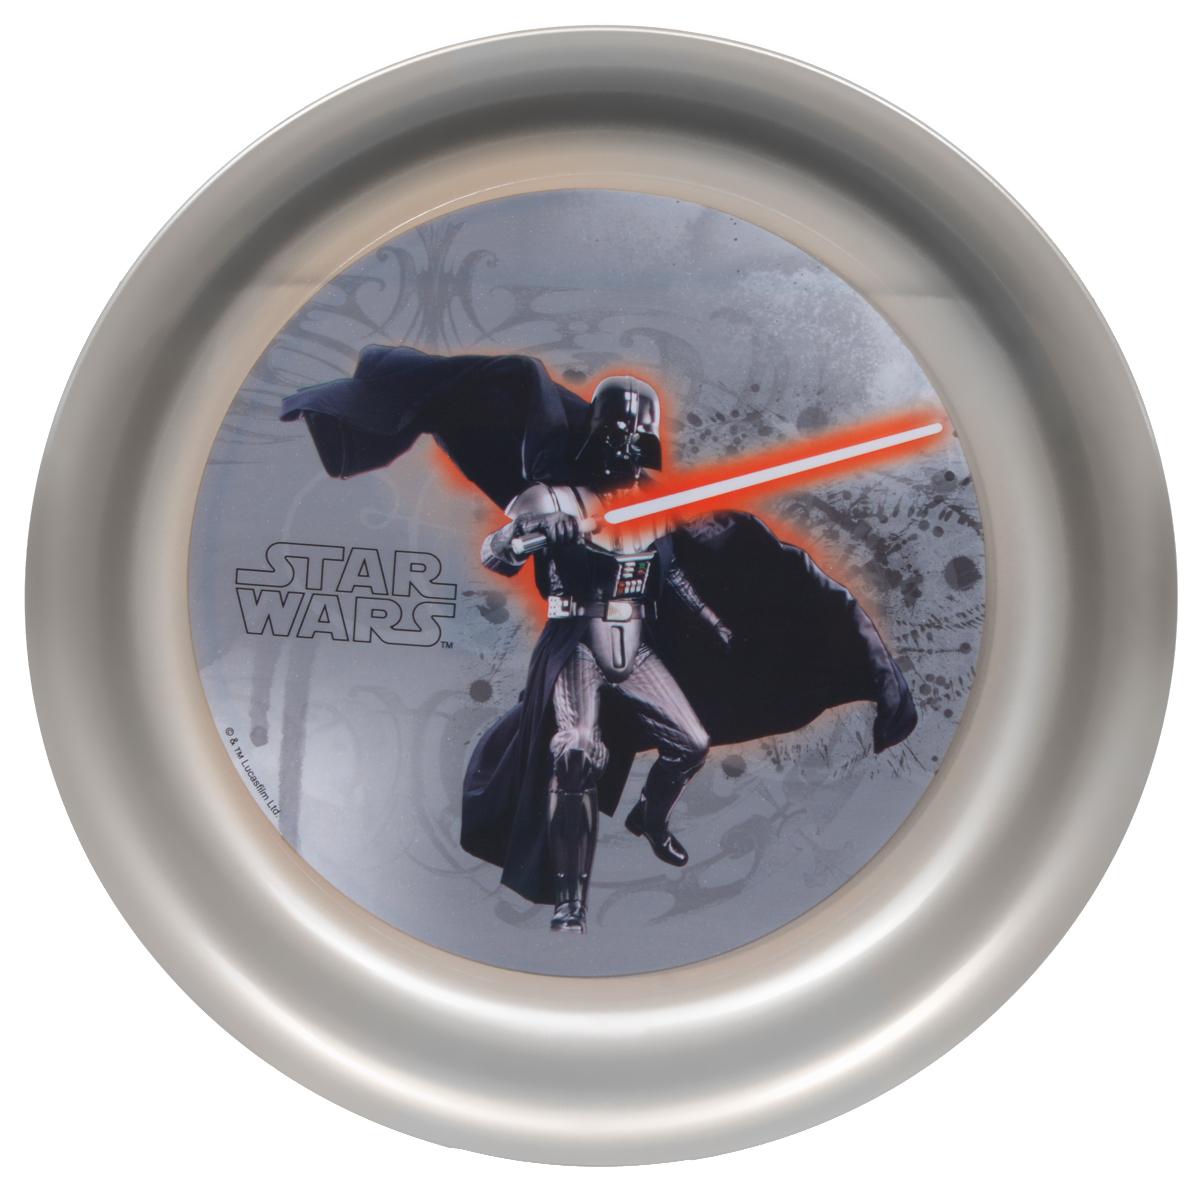 Star Wars Тарелка детская Дарт Вейдер диаметр 19 см